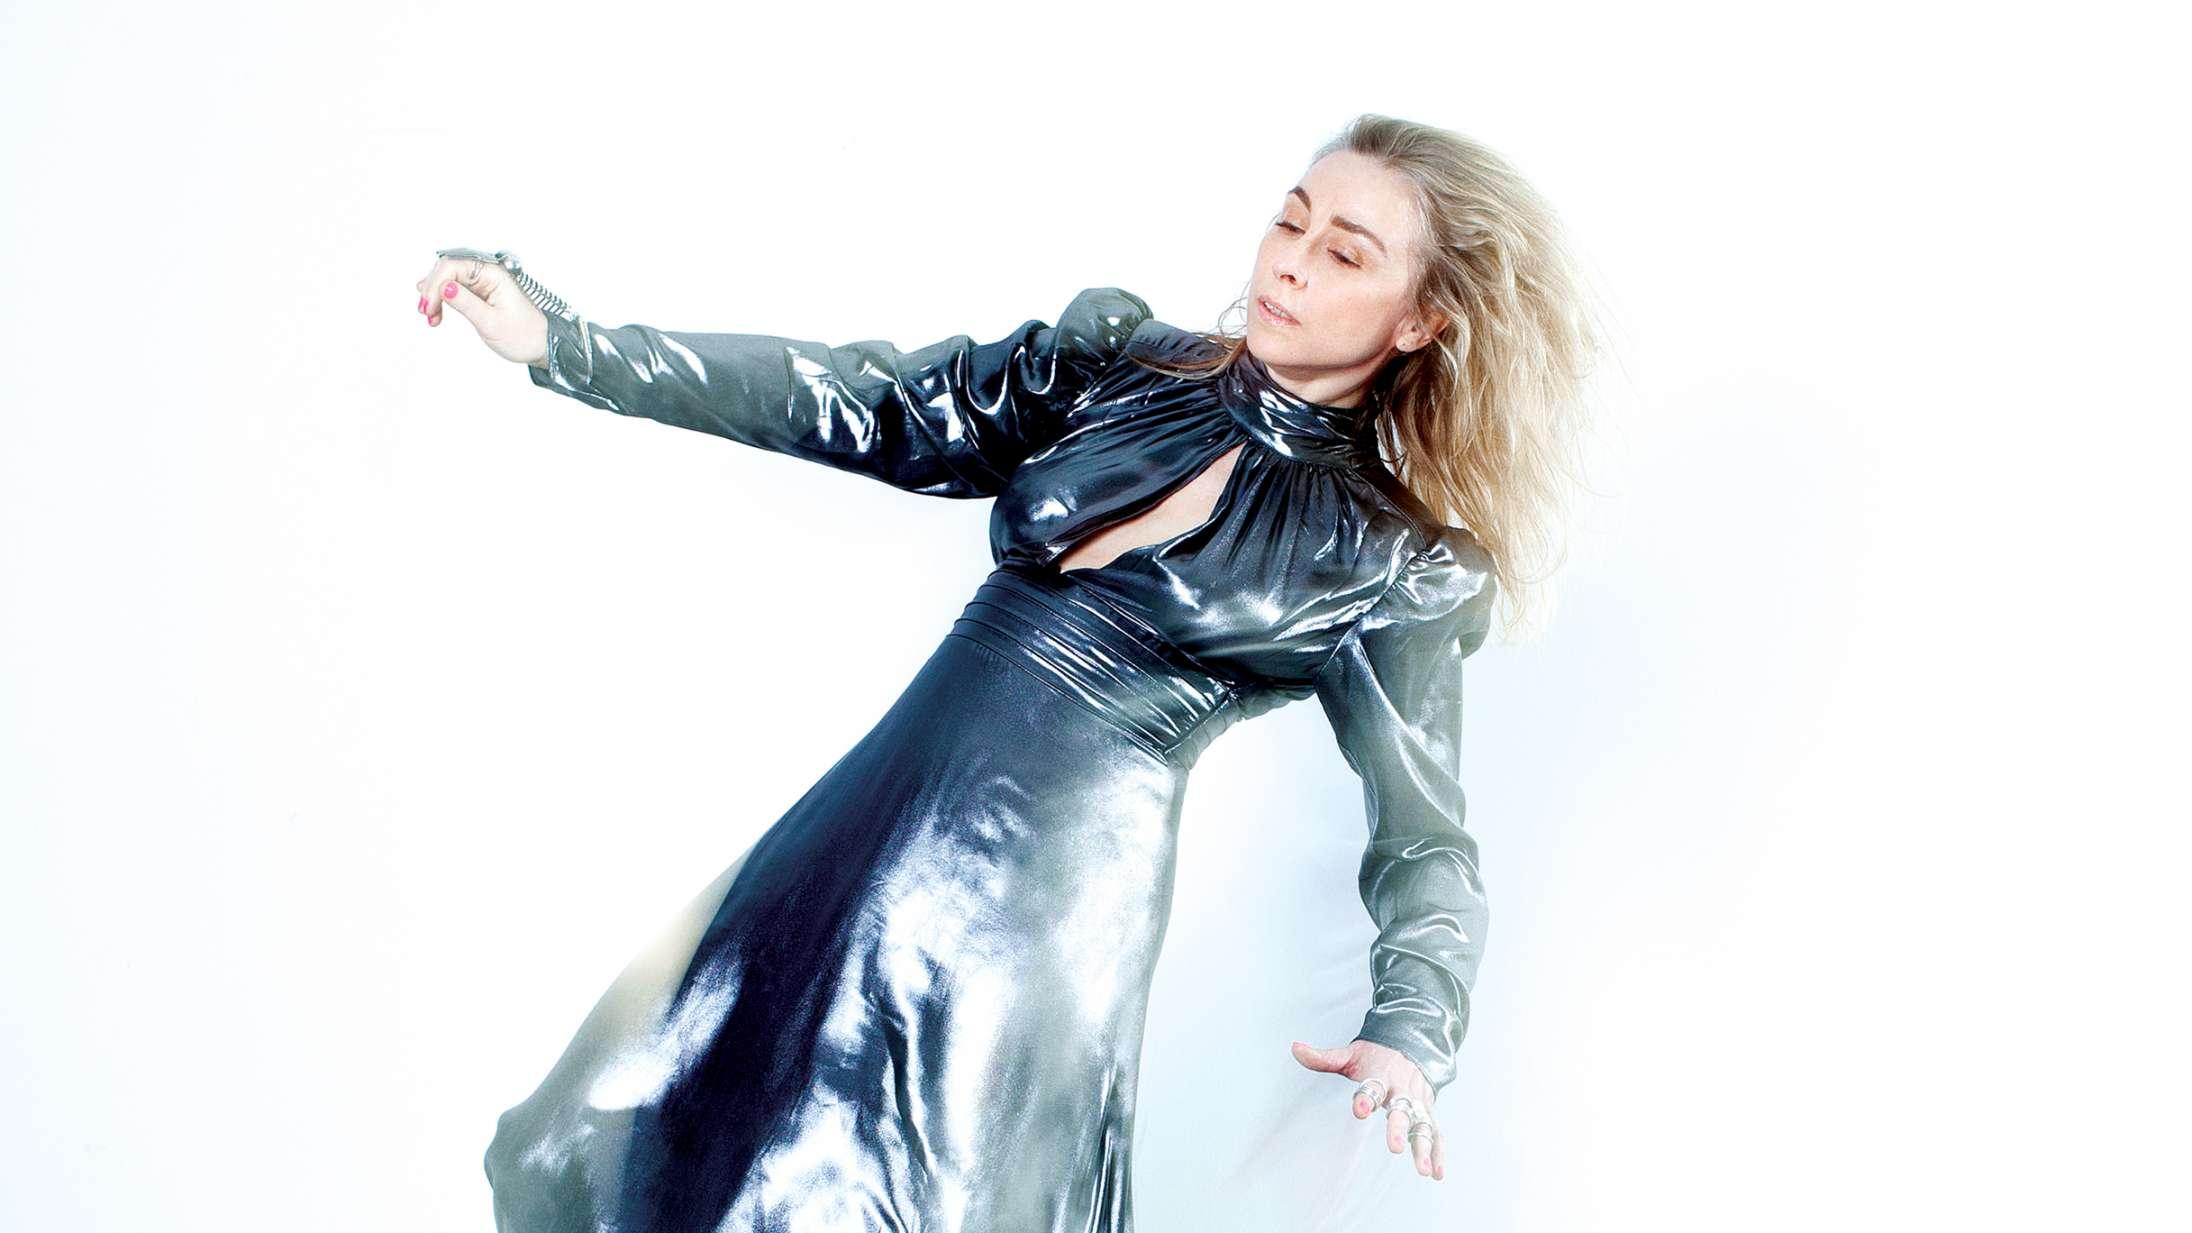 'Magnet Sky': Nana Jacobis nye lyd er som skræddersyet til hende